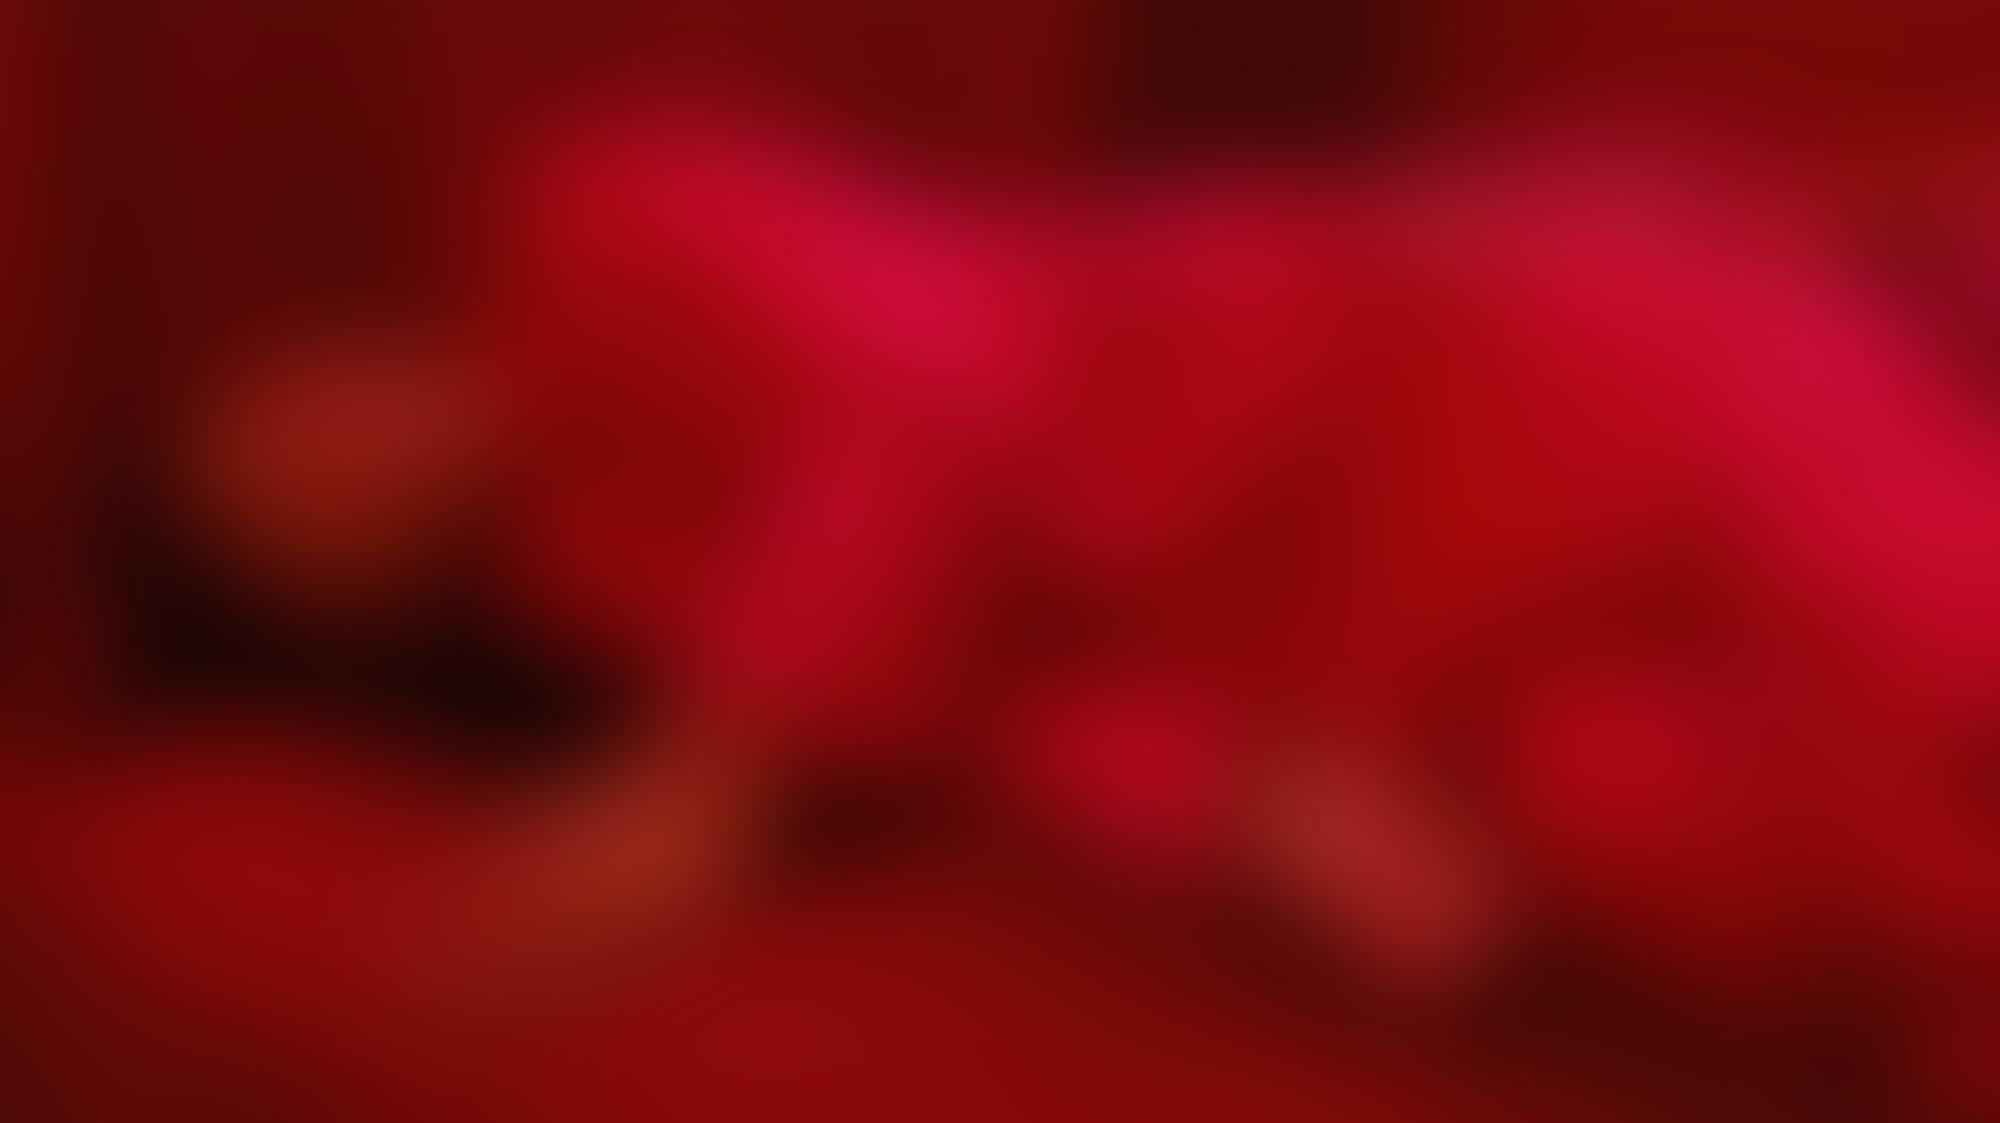 Hanger inc With Studio Augmenta 01 200210 102424 autocompressfitresizeixlibphp 1 1 0max h2000max w3 D2000q80sc3f85e761bbfc5143f94919dbc21762b